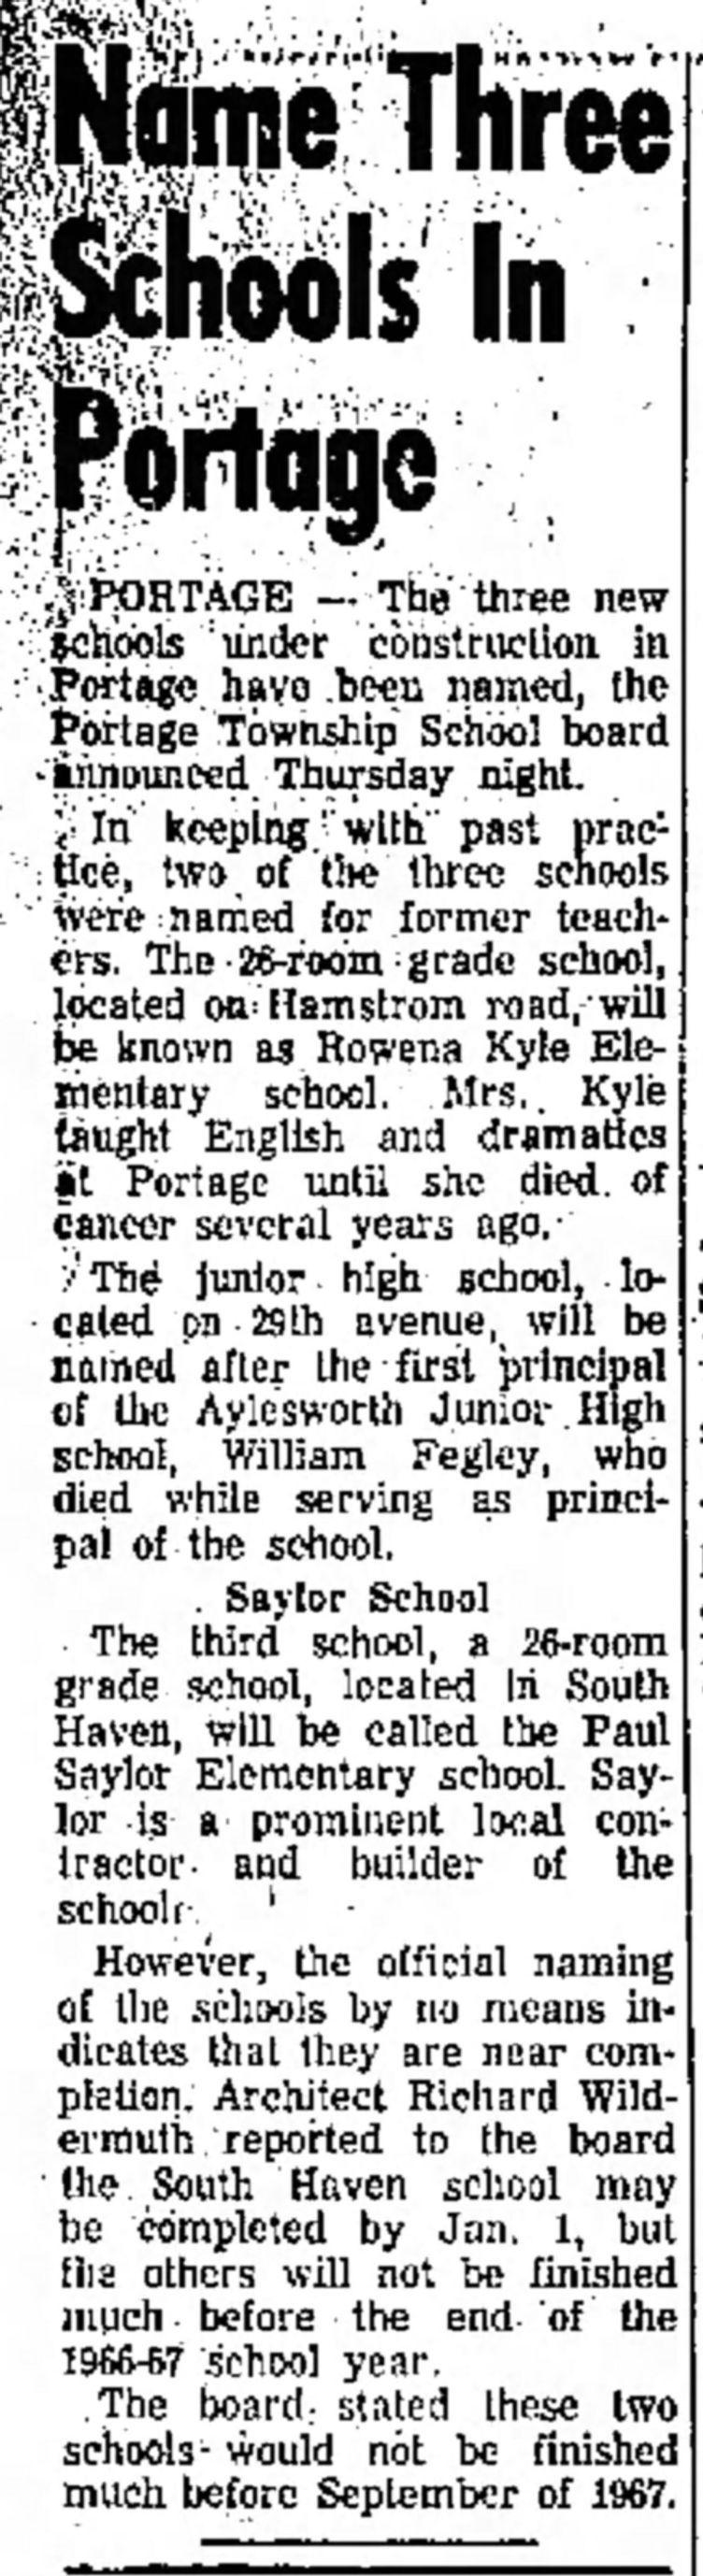 Saylor Elementary School.